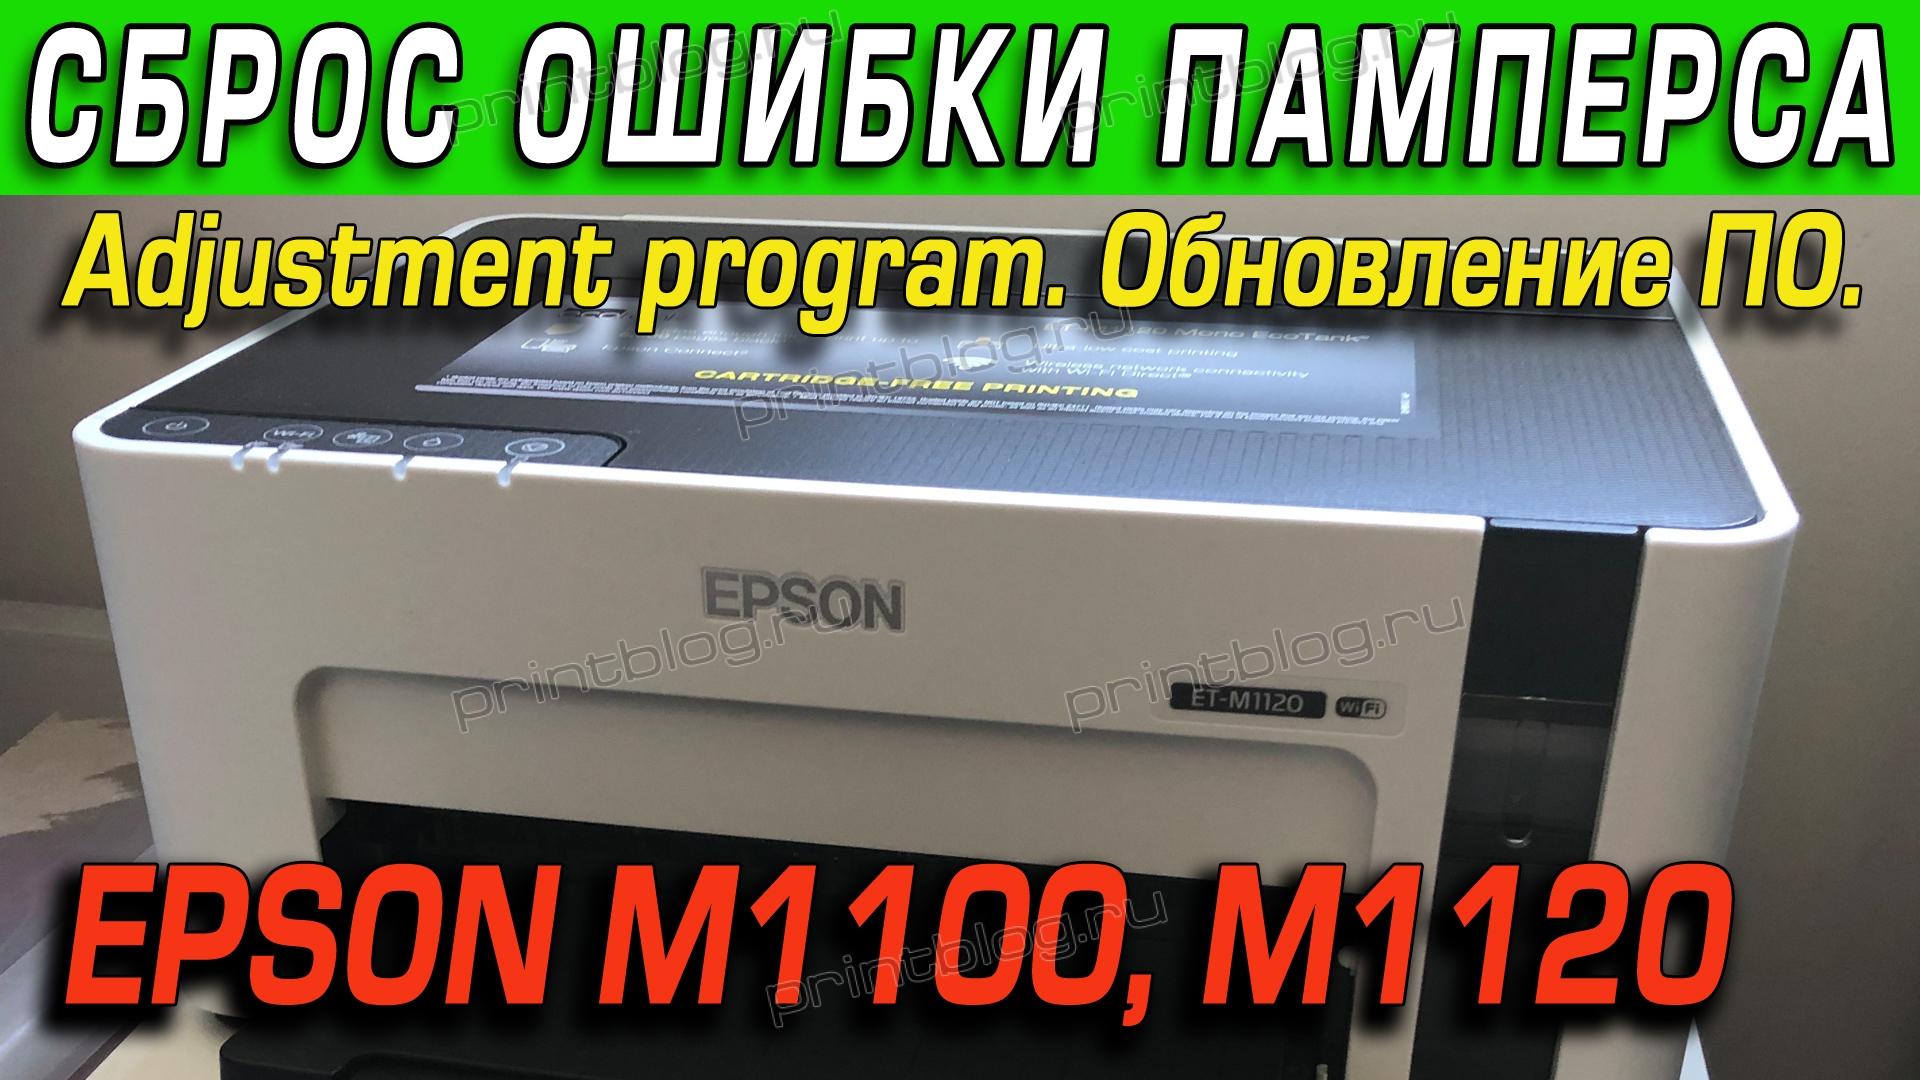 Сброс памперса Epson M1100, M1120 и ET-M1100, ET-M1120